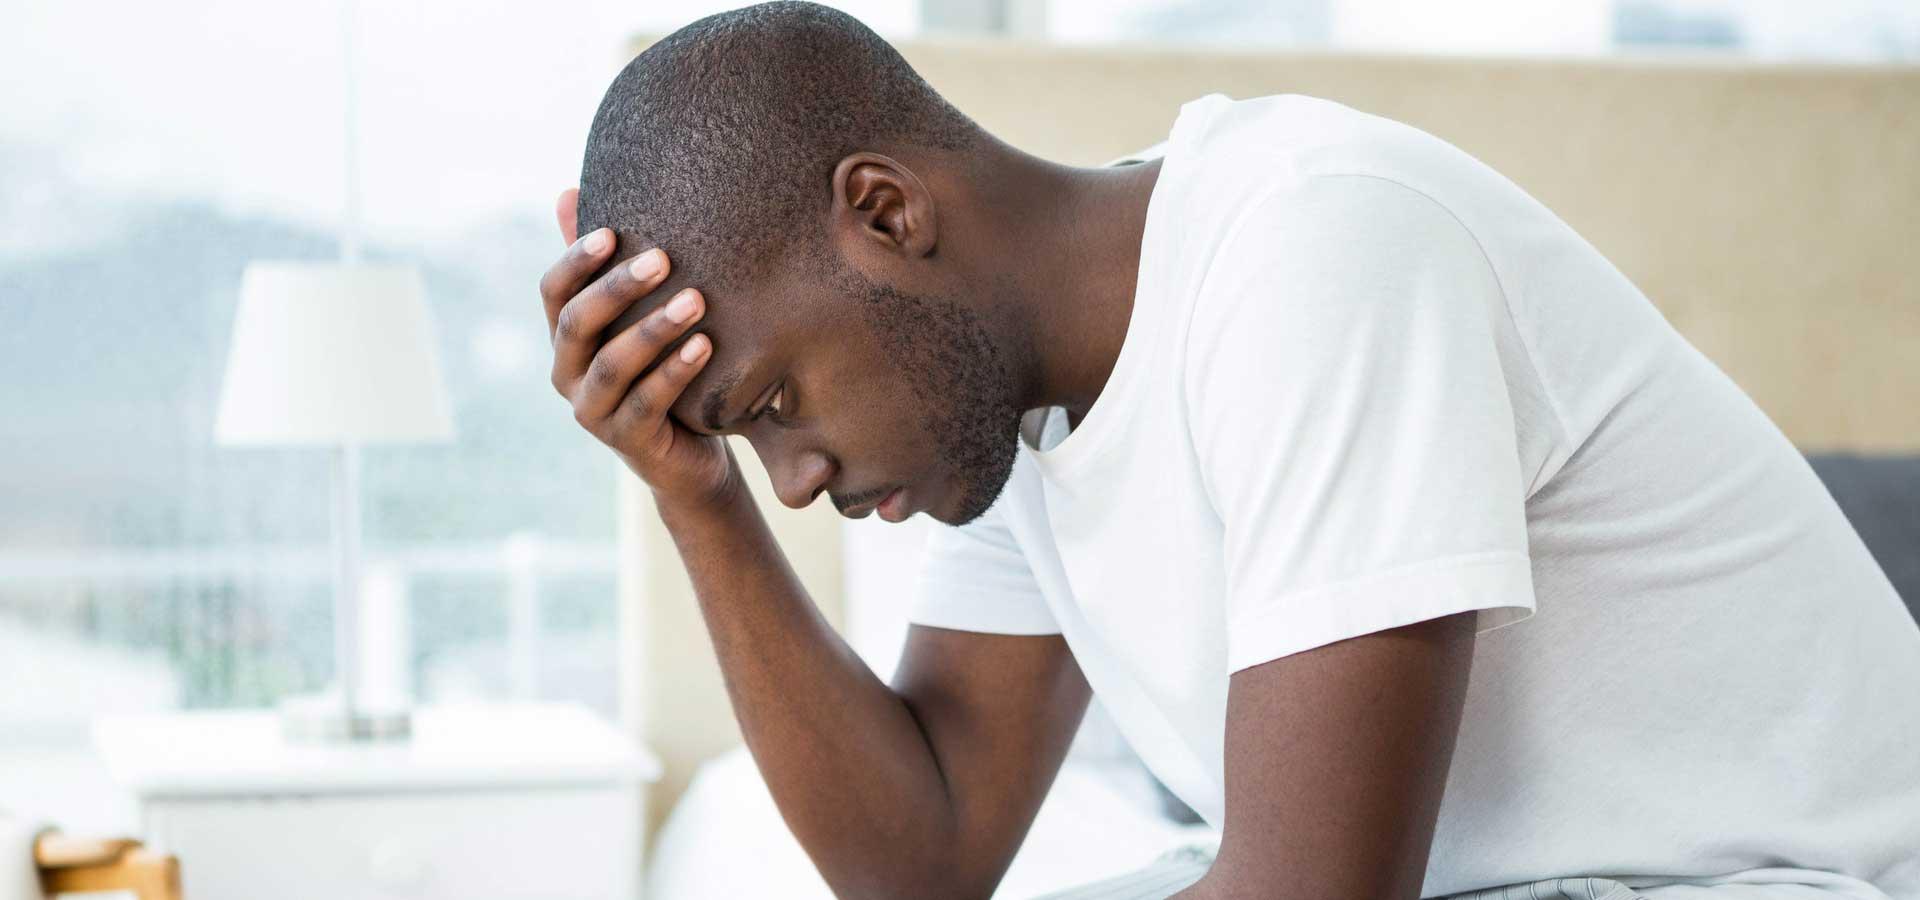 Ketamine treatment for depression in Woodstock, GA